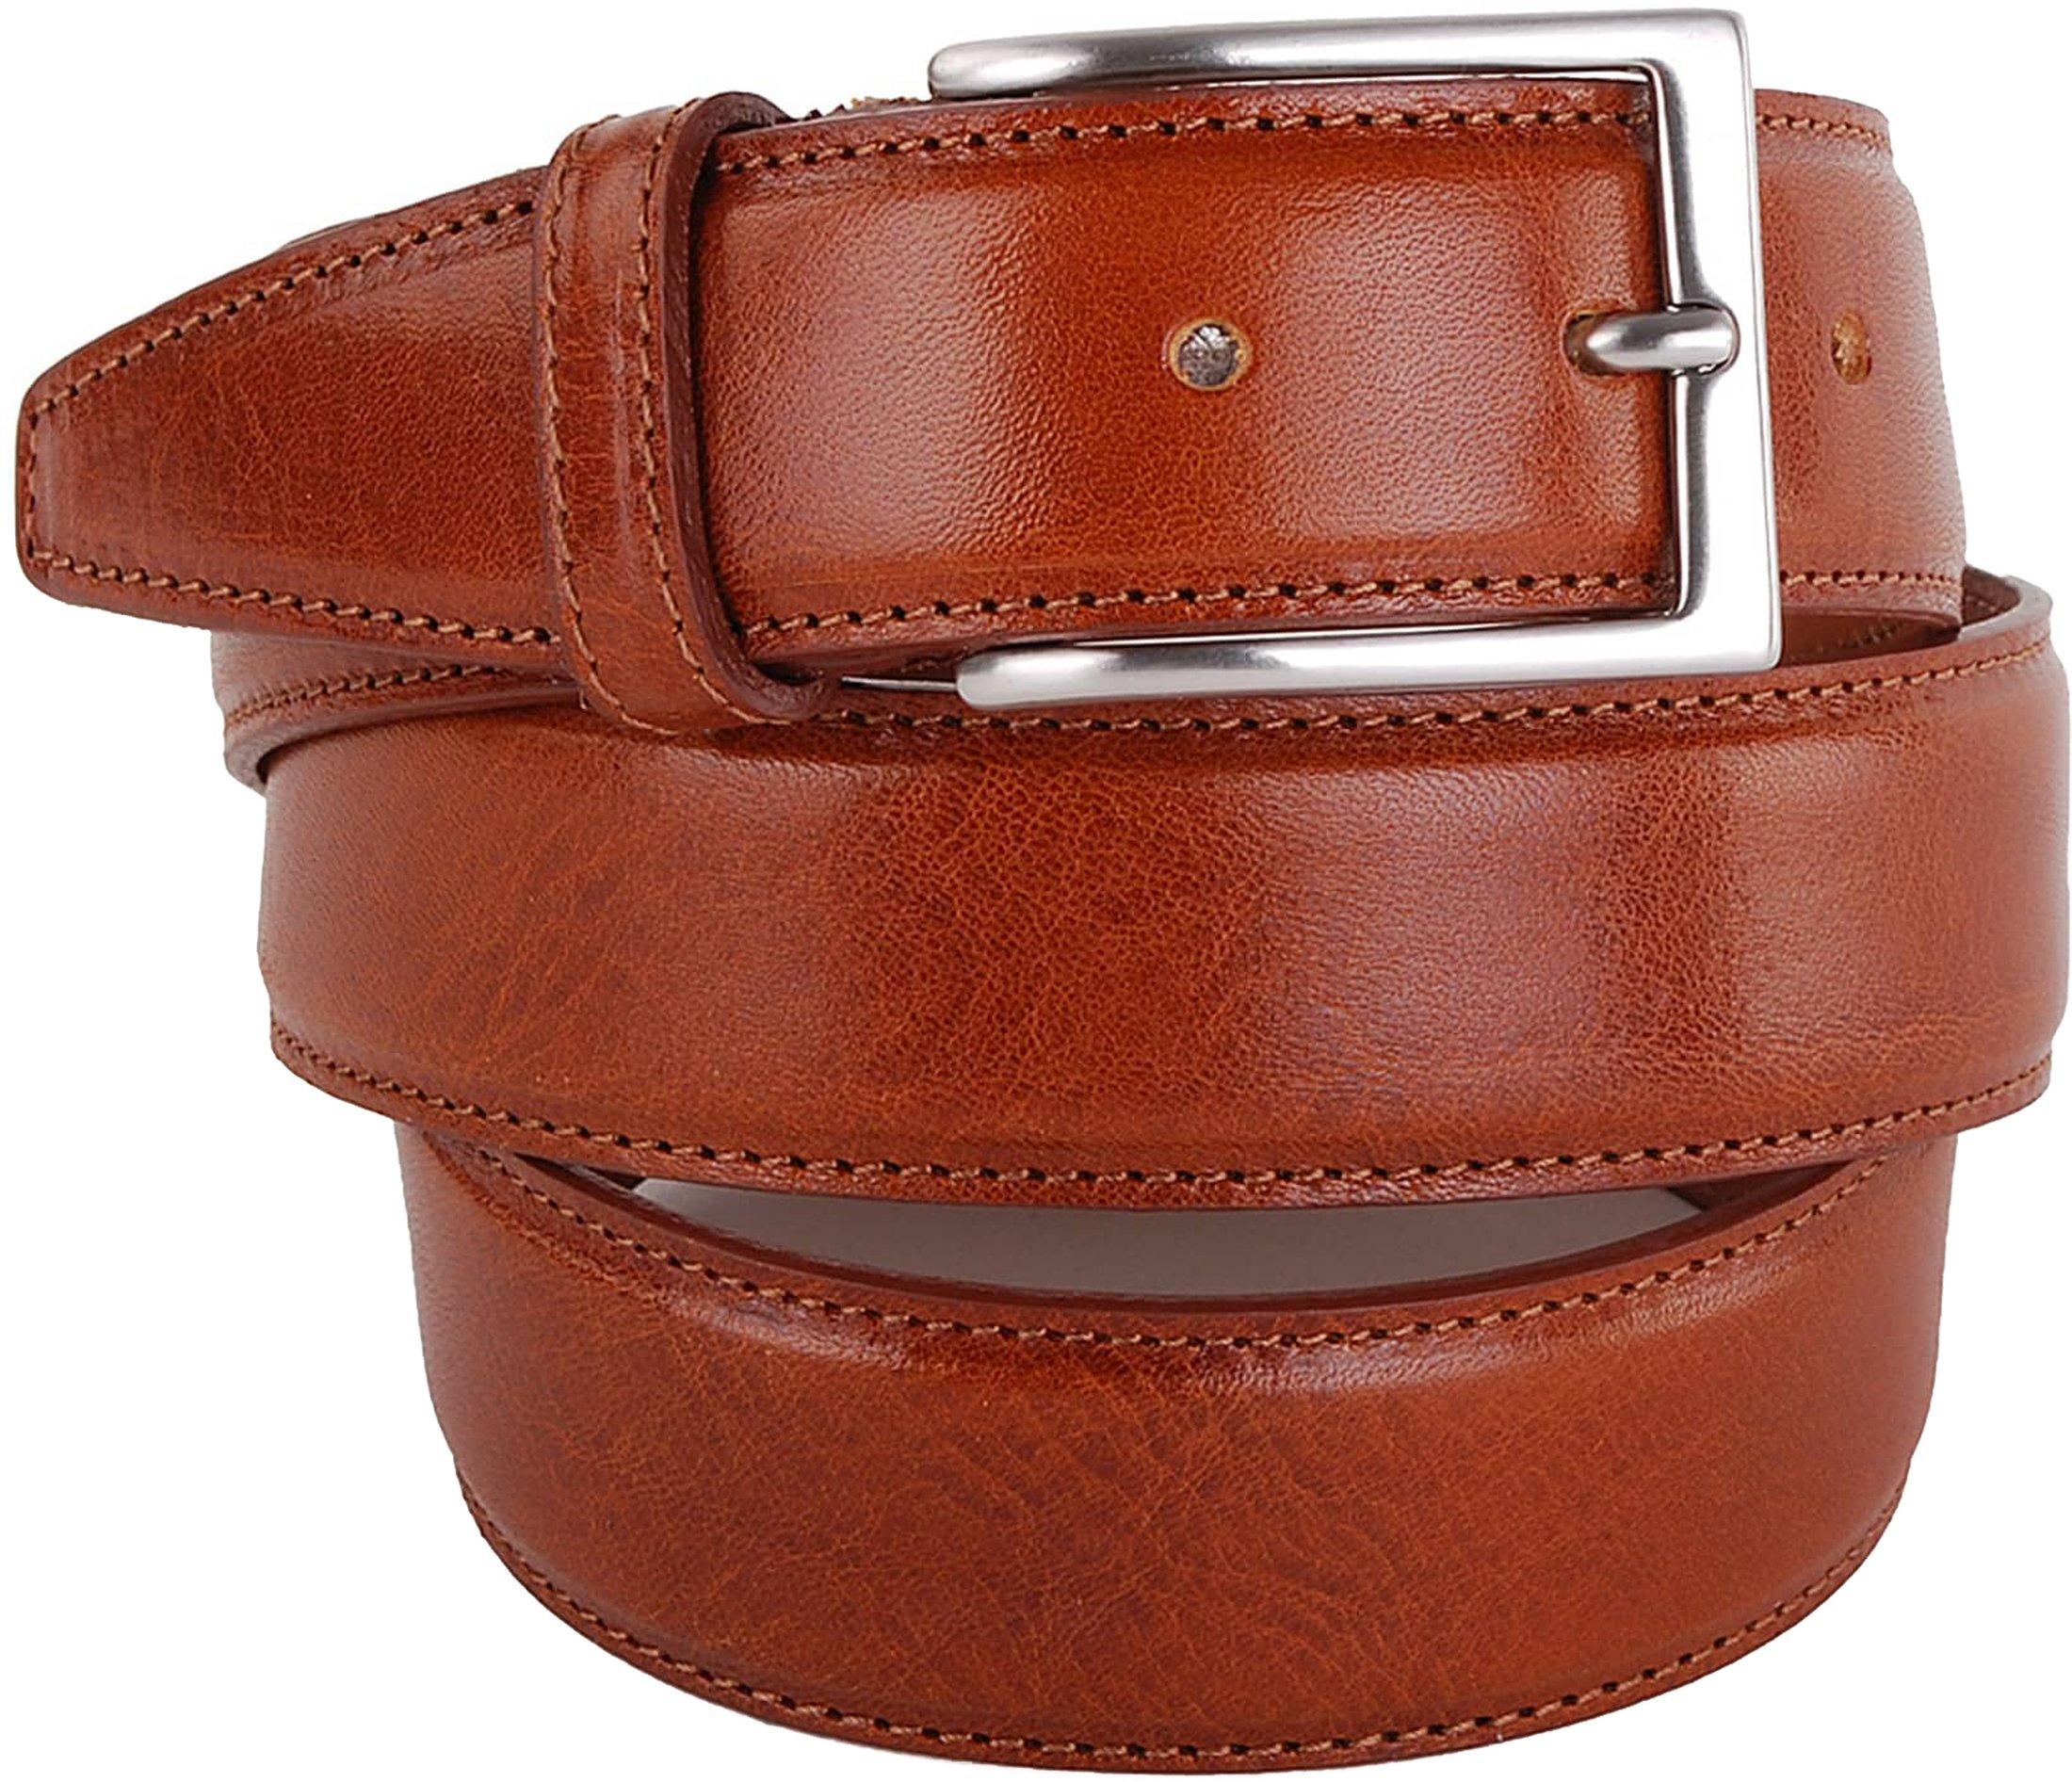 Profuomo Leather Belt Cognac